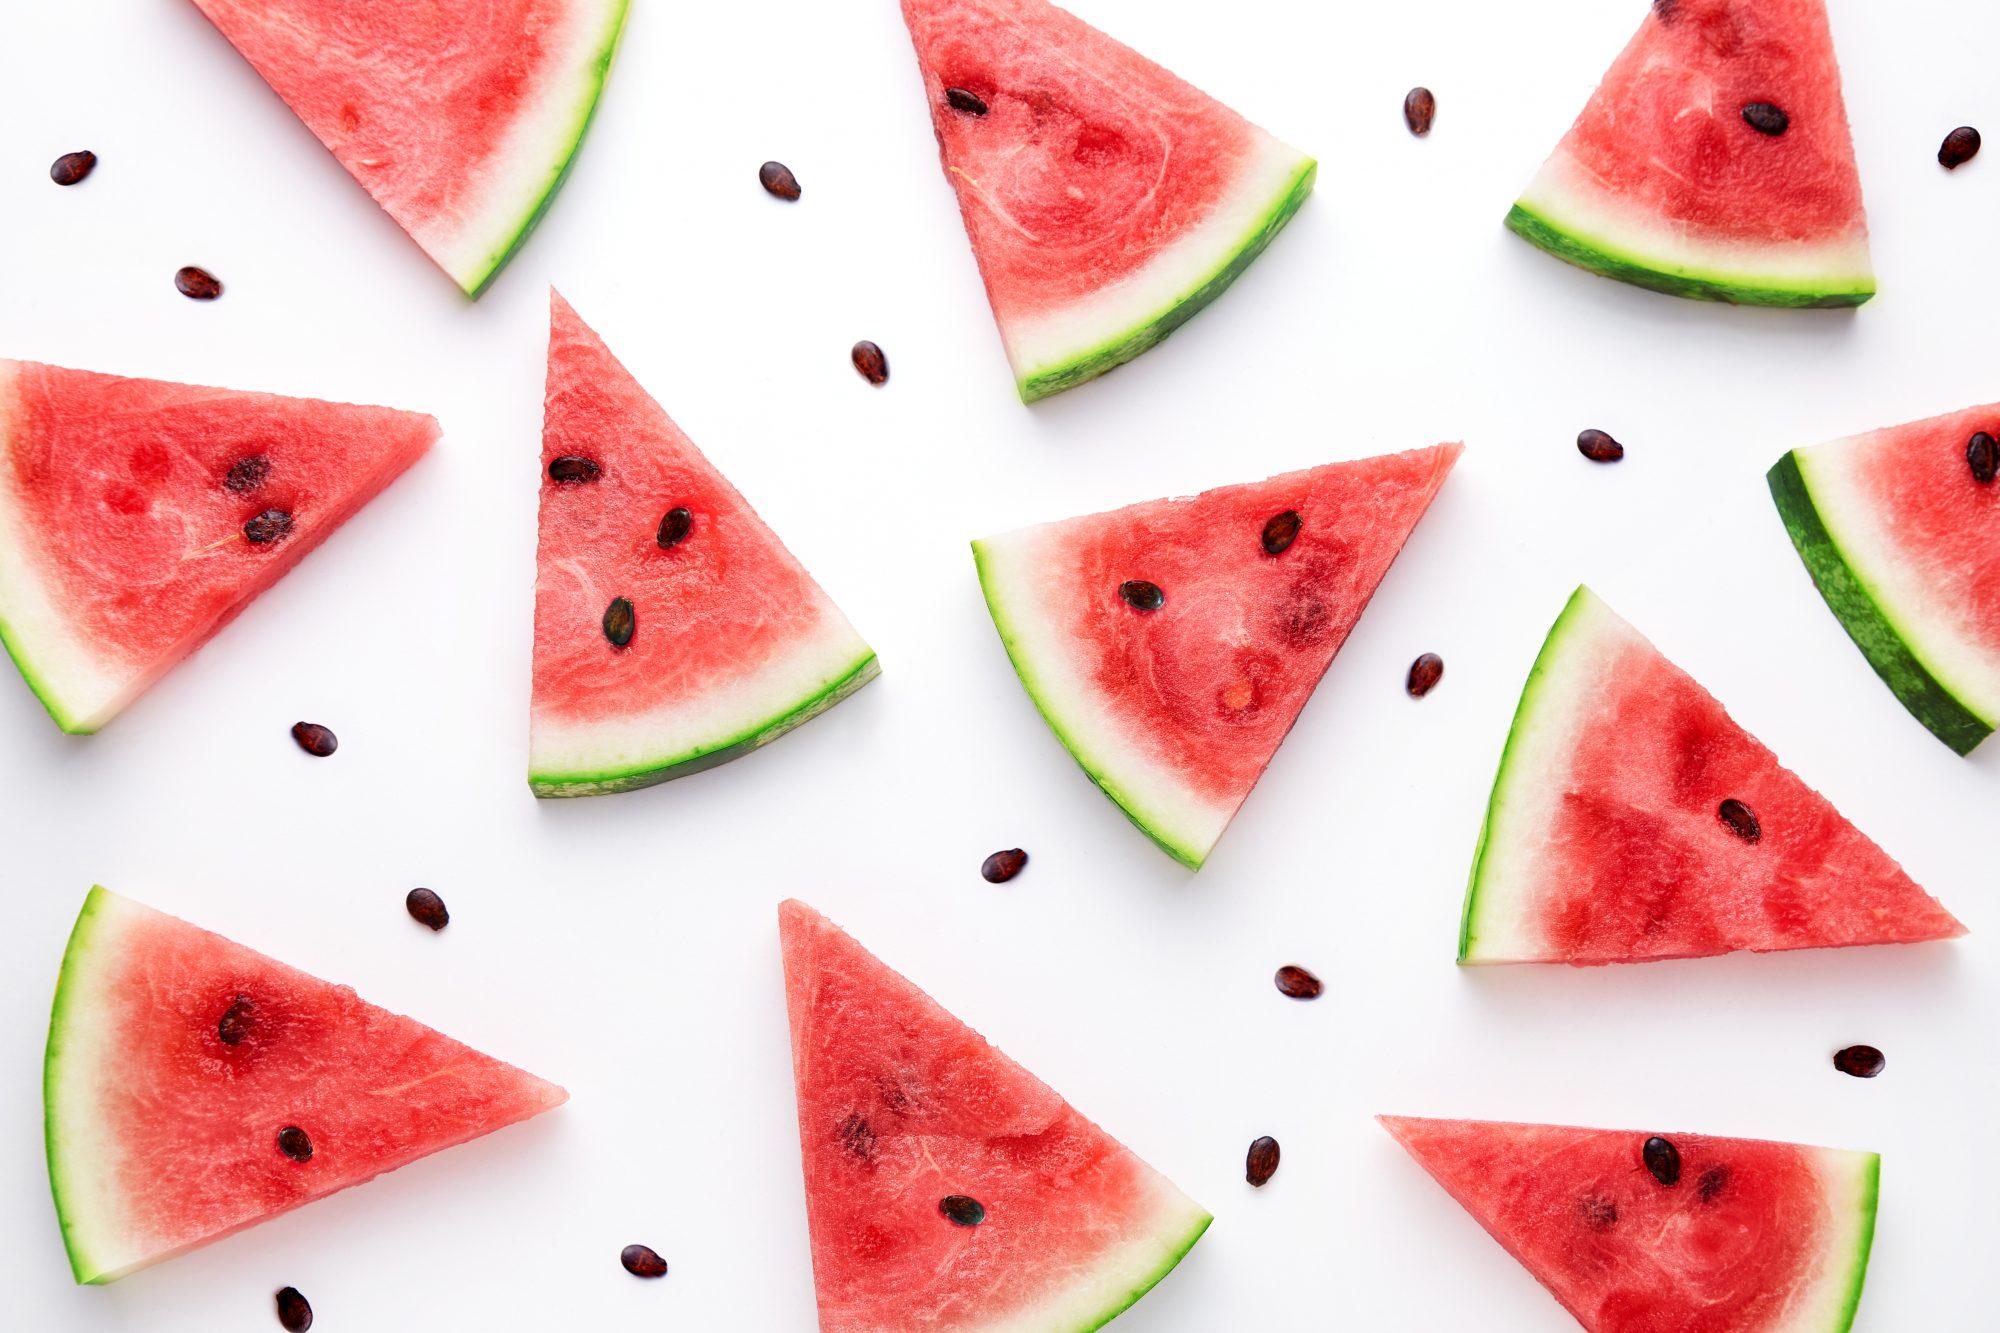 Getty 2/6/20 Watermelon